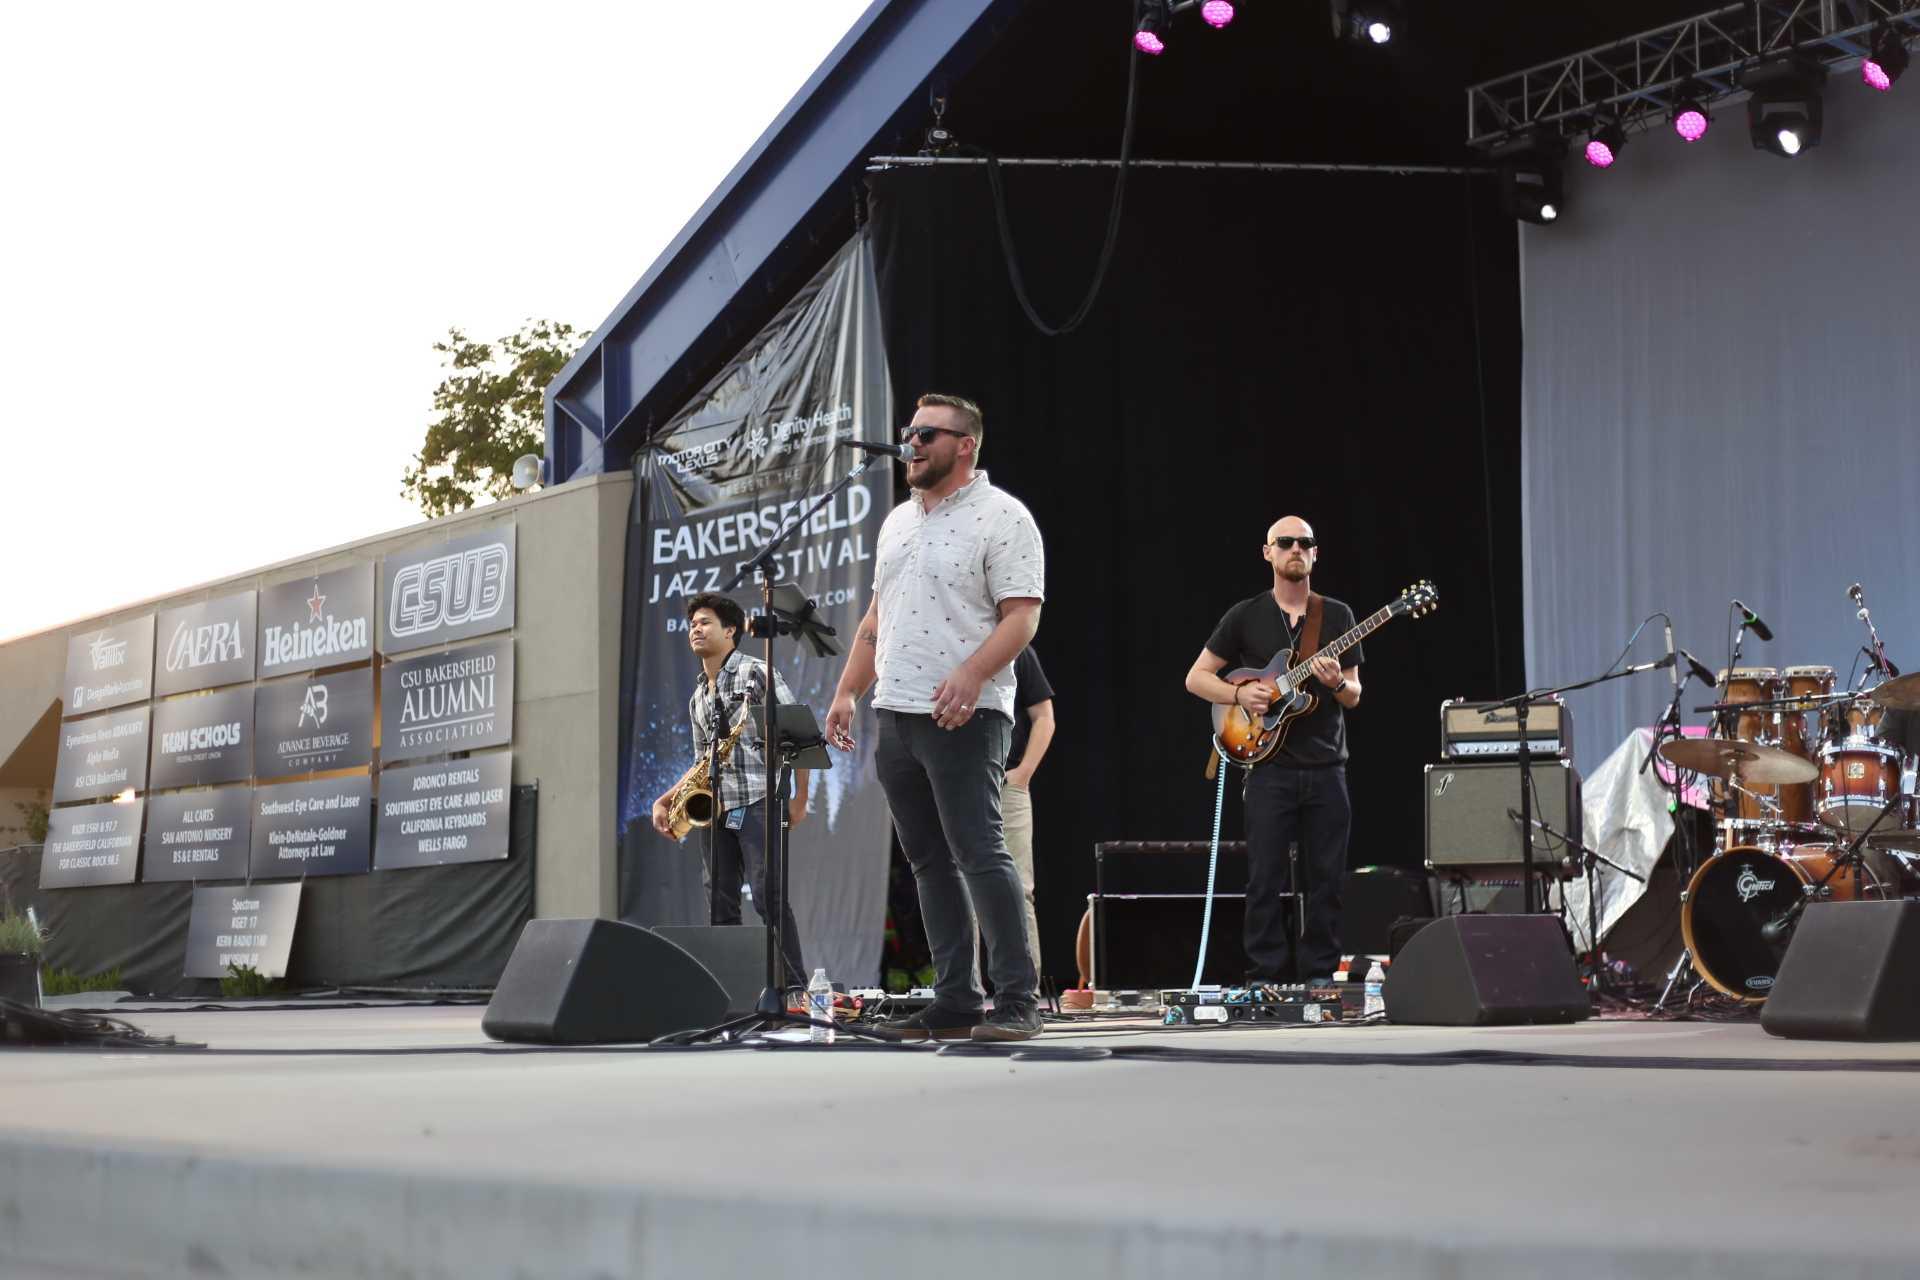 Jazz Festival Returns to CSUB